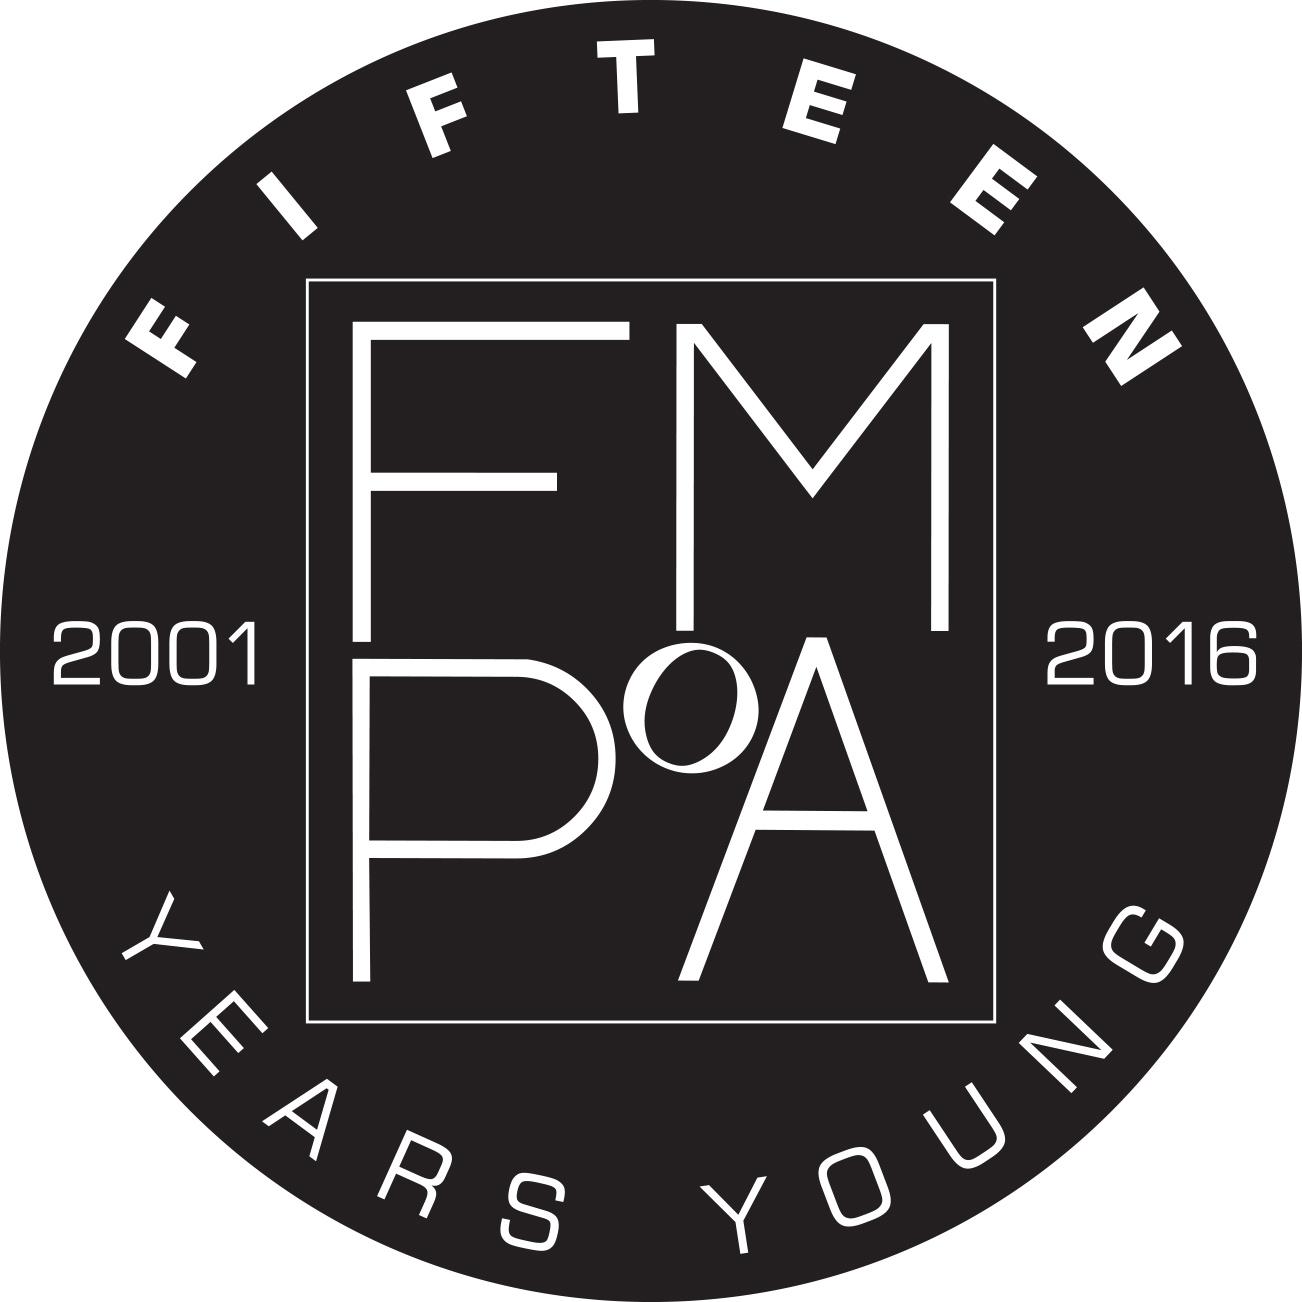 FMoPA Photography Competition 2016 - logo